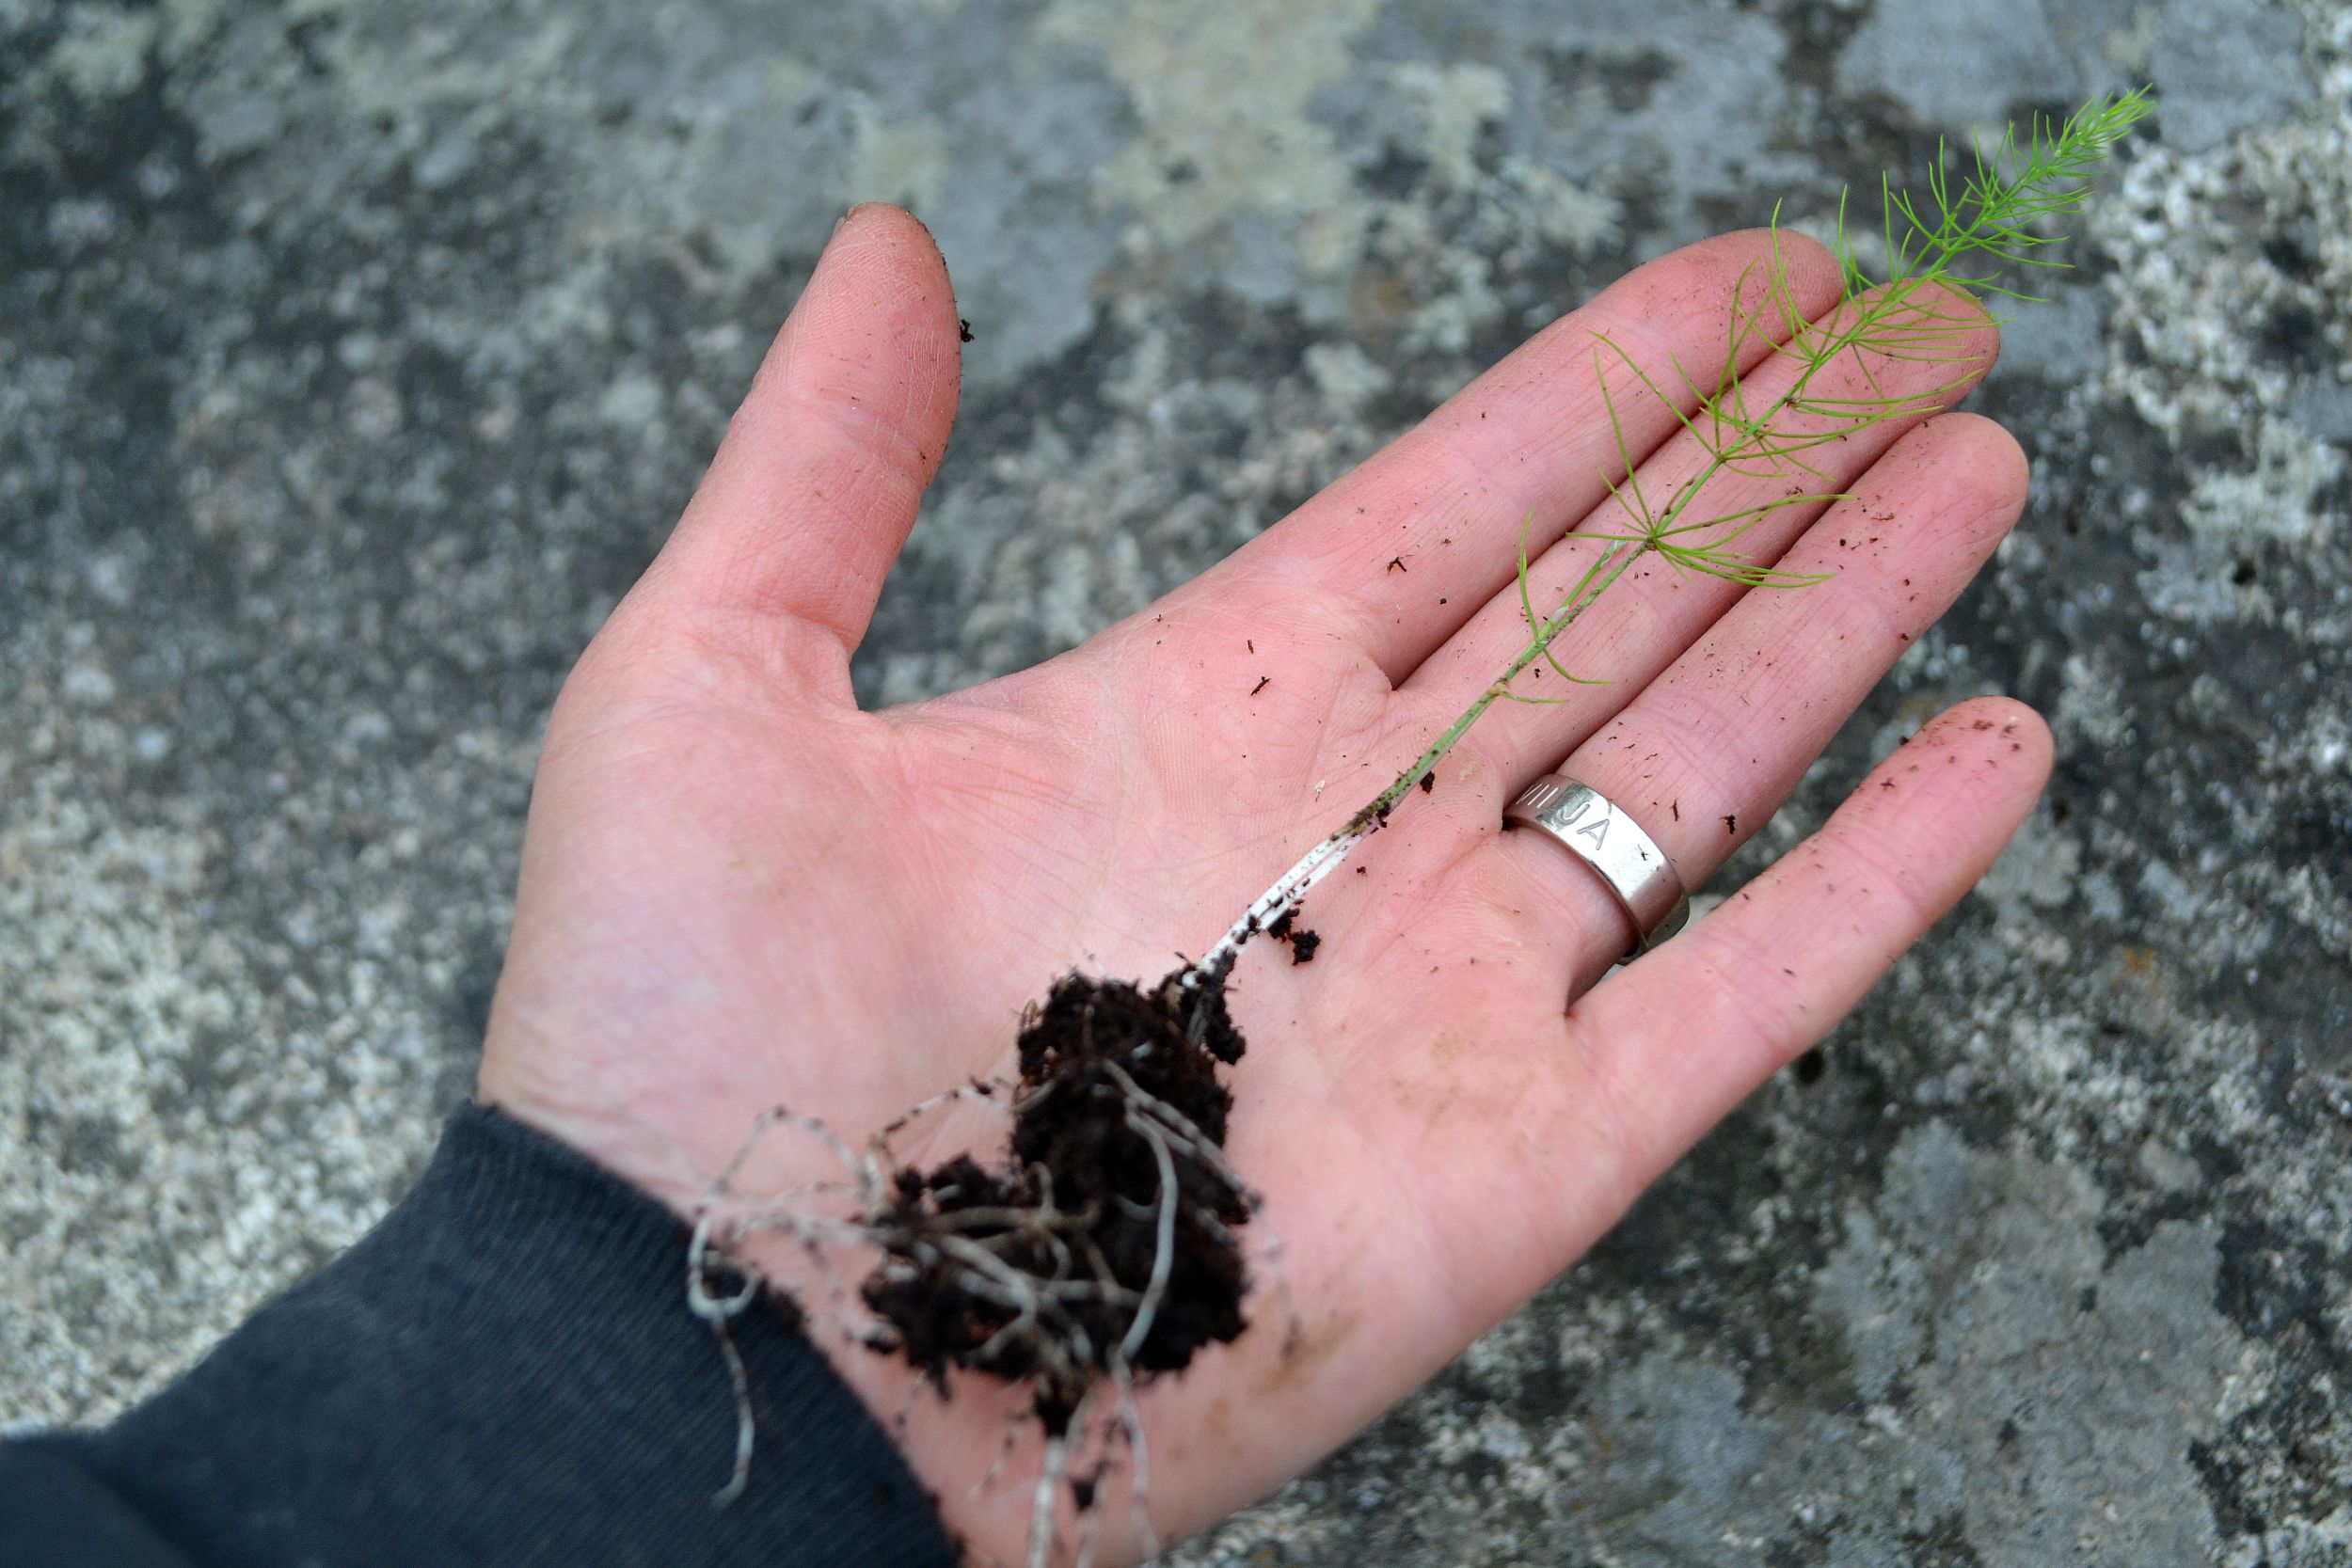 En liten sparrisplanta ligger i min hand. All about asparagus, a new asparagus plant in my hand.